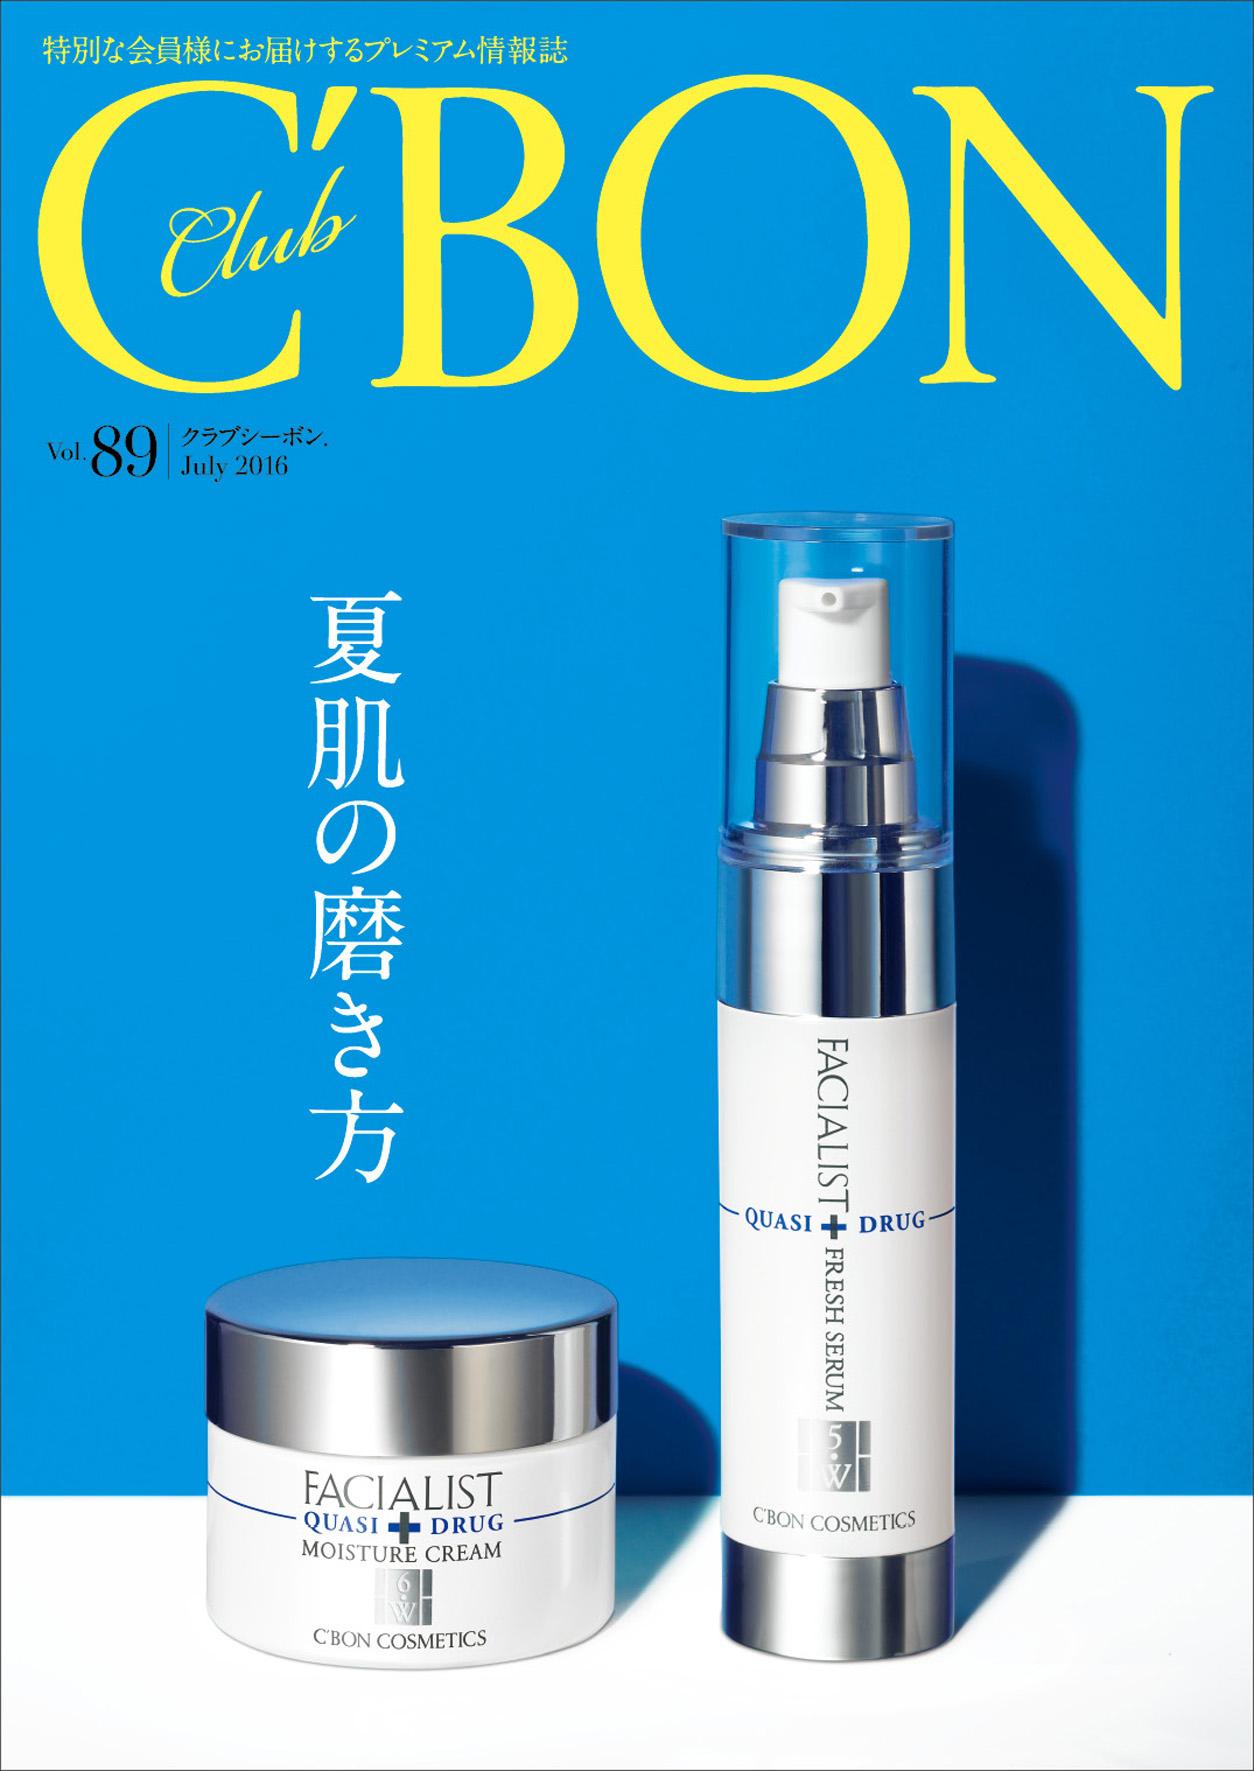 シーボン(化粧品会社) 広報誌「CLUB C'BON」